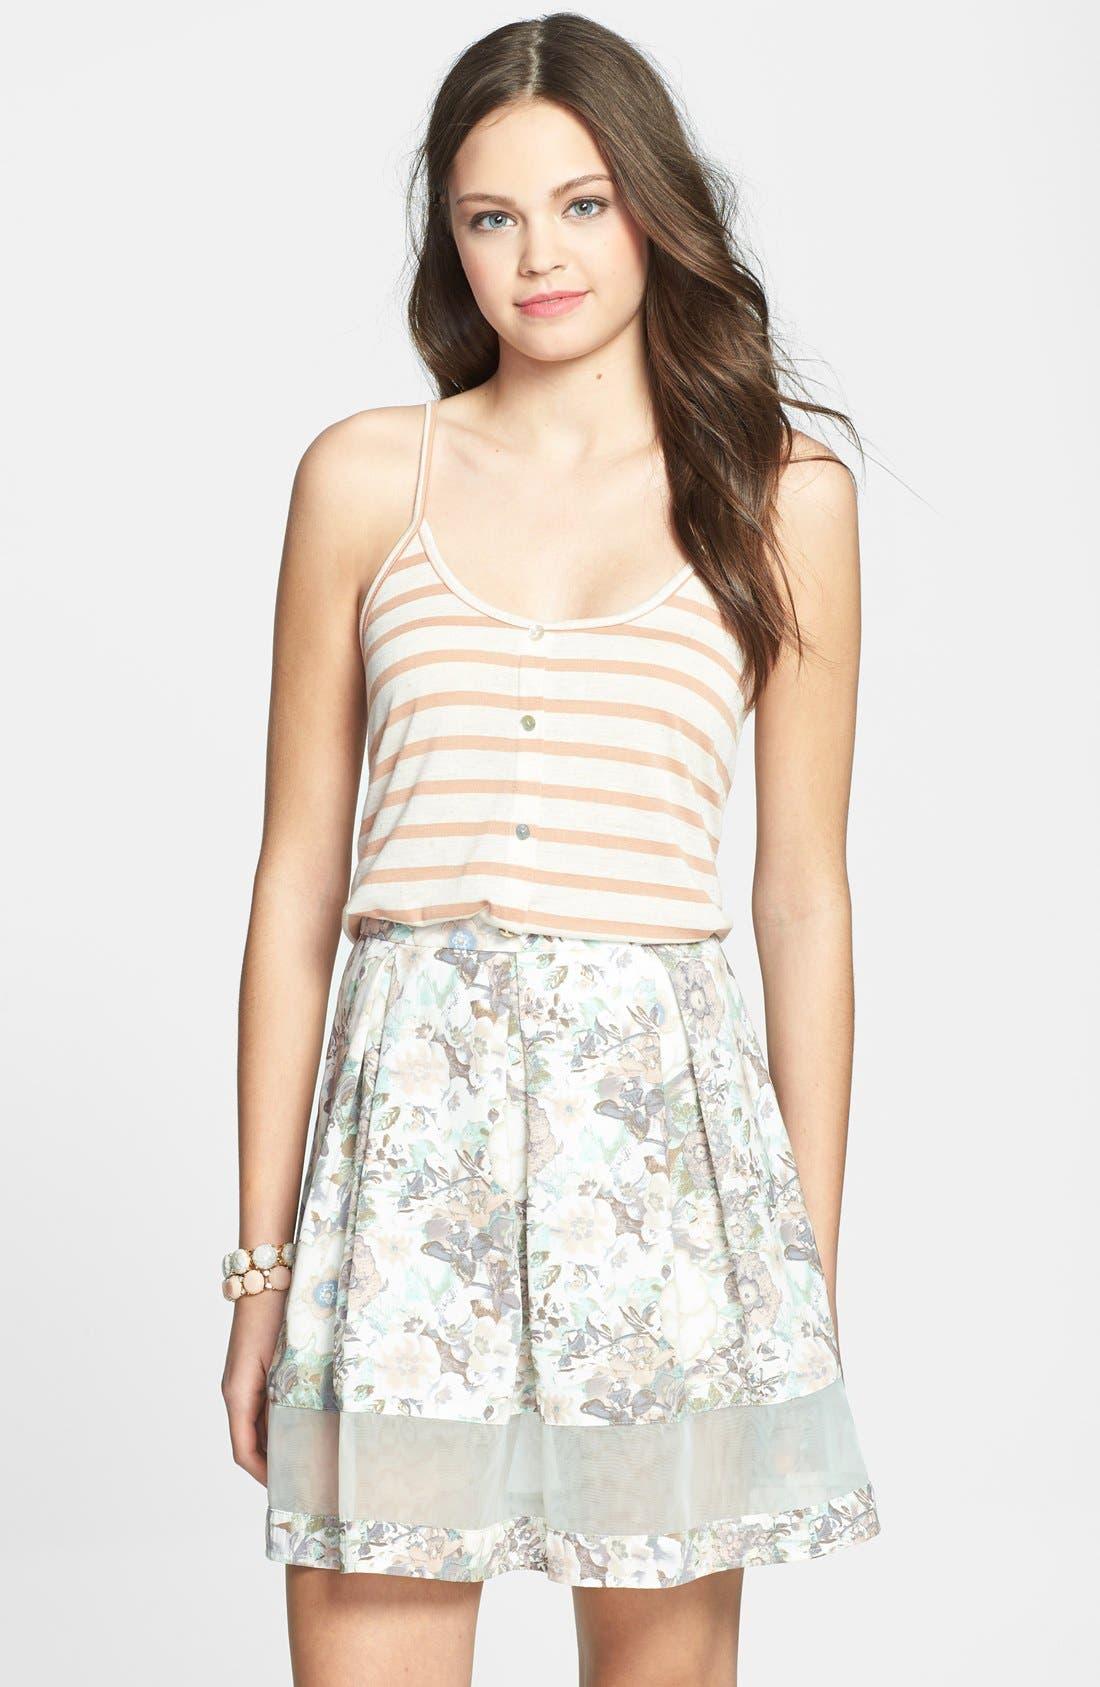 Alternate Image 1 Selected - BCNU Floral Print Organza Inset Pleat Skirt (Juniors)